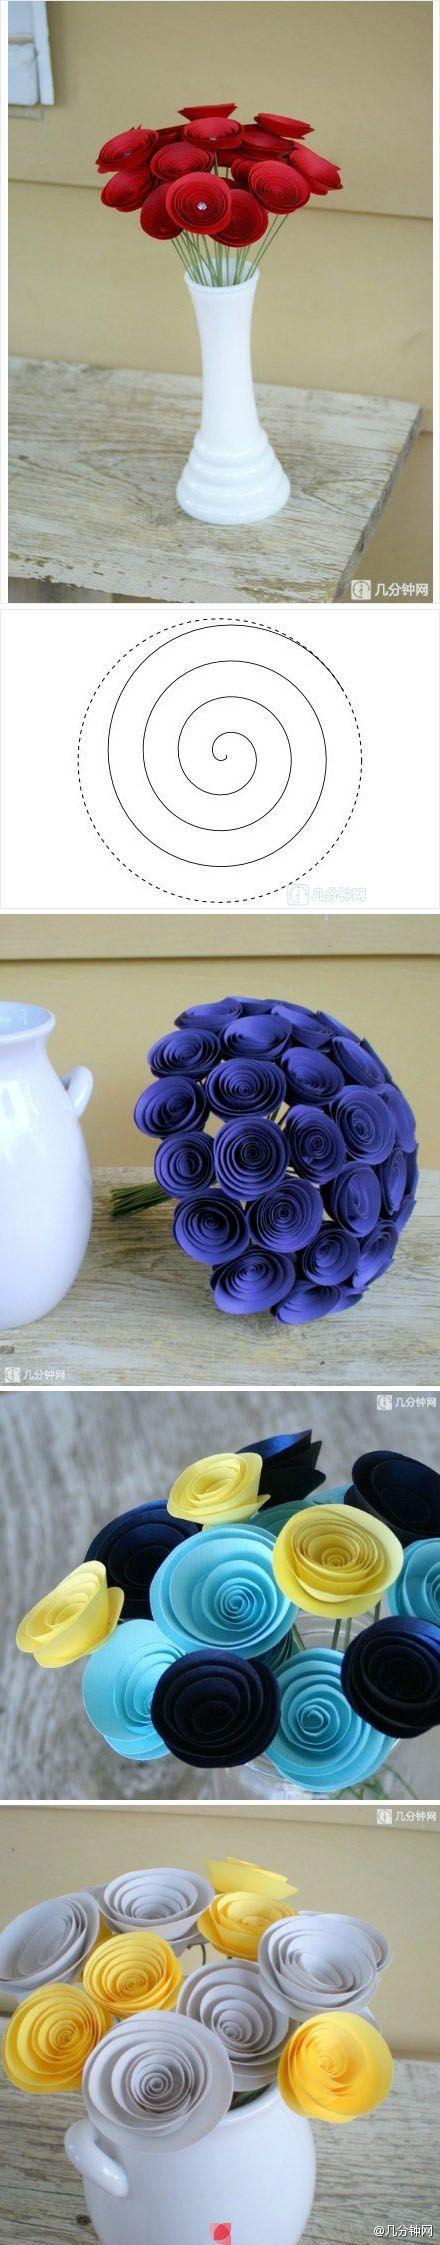 Beautiful modern actual paper flowers DIY craft tutorial